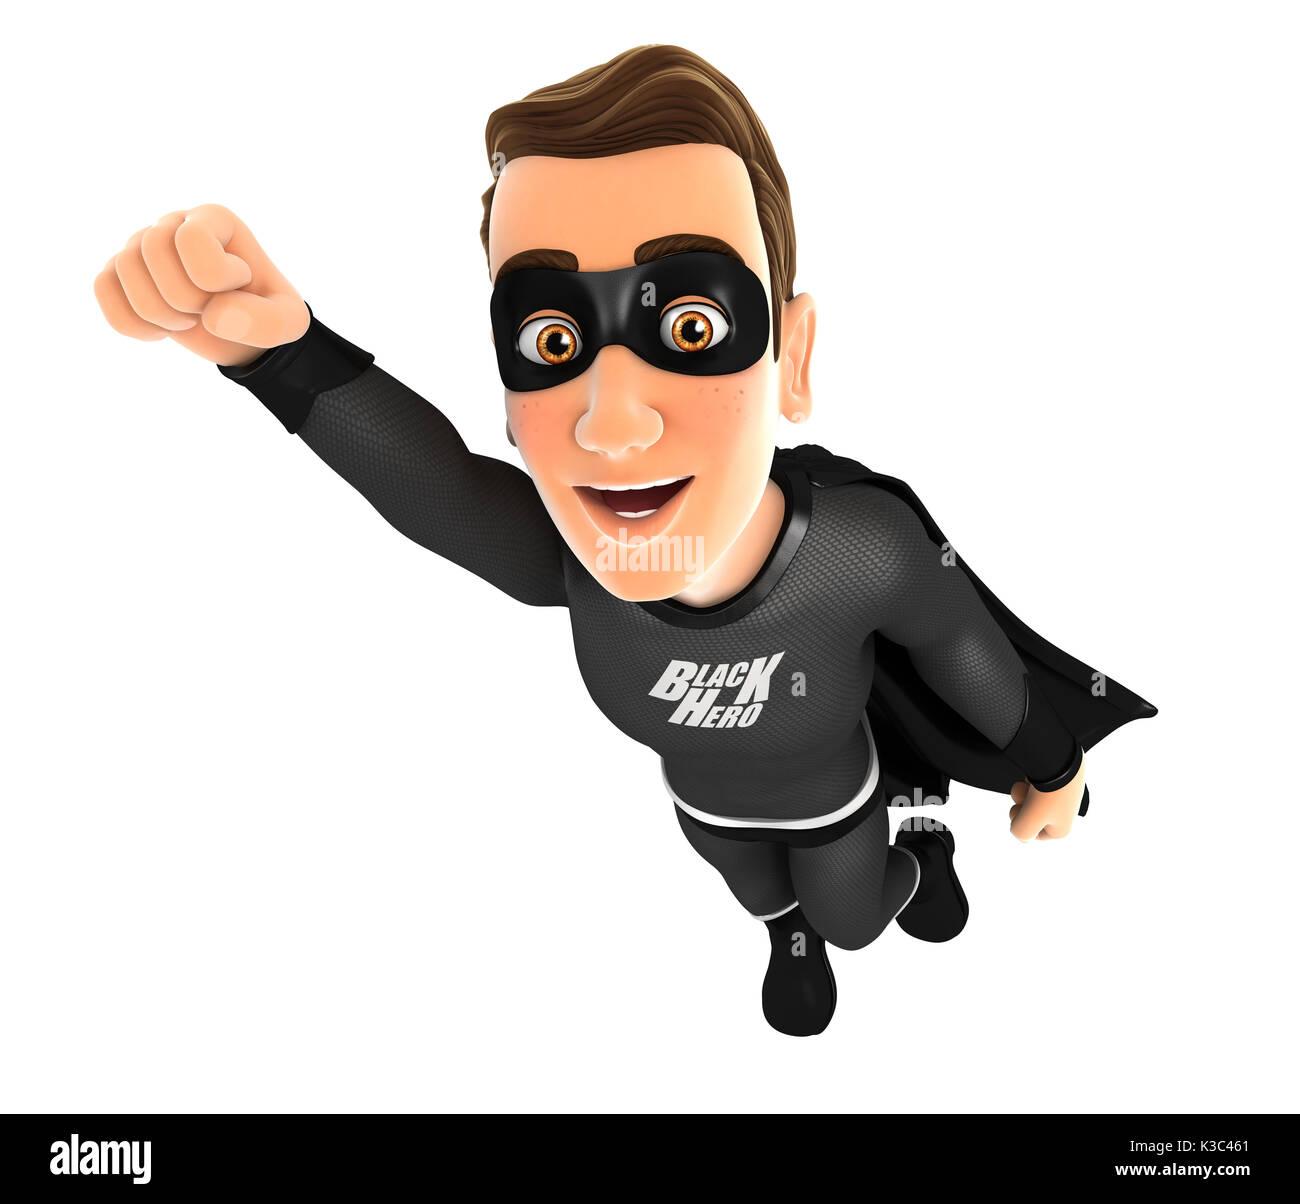 3d black hero flying, illustration with isolated white background - Stock Image